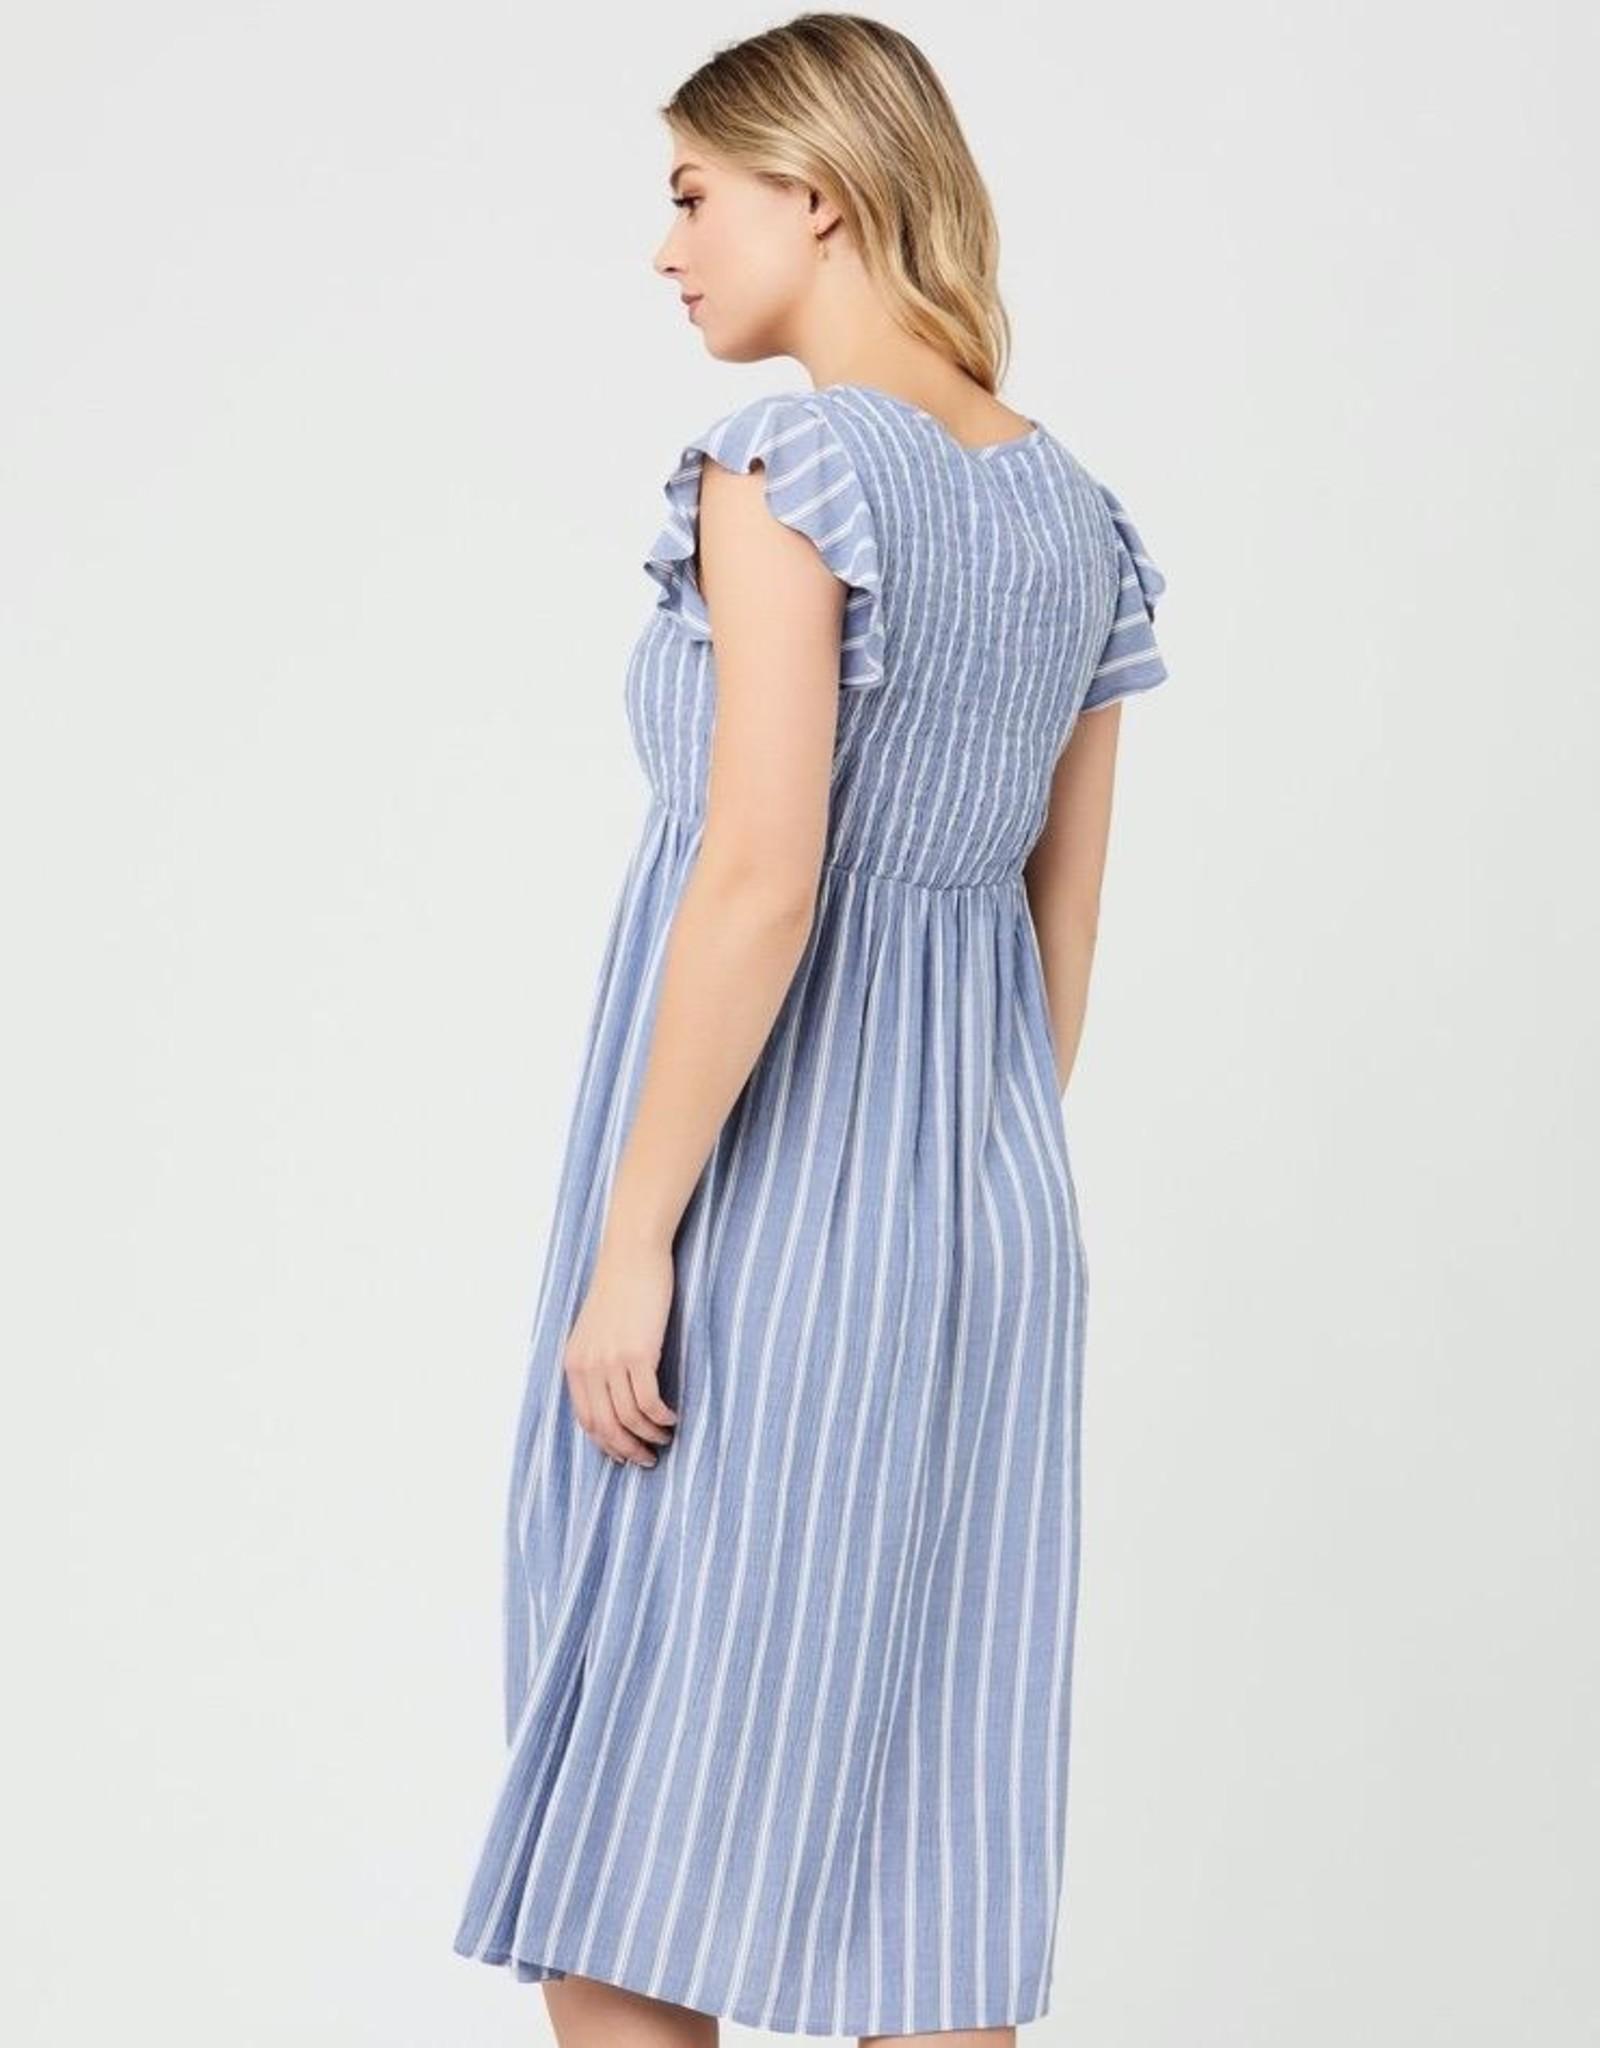 Ripe Maternity Sofia Shirred Dress in Blue & White